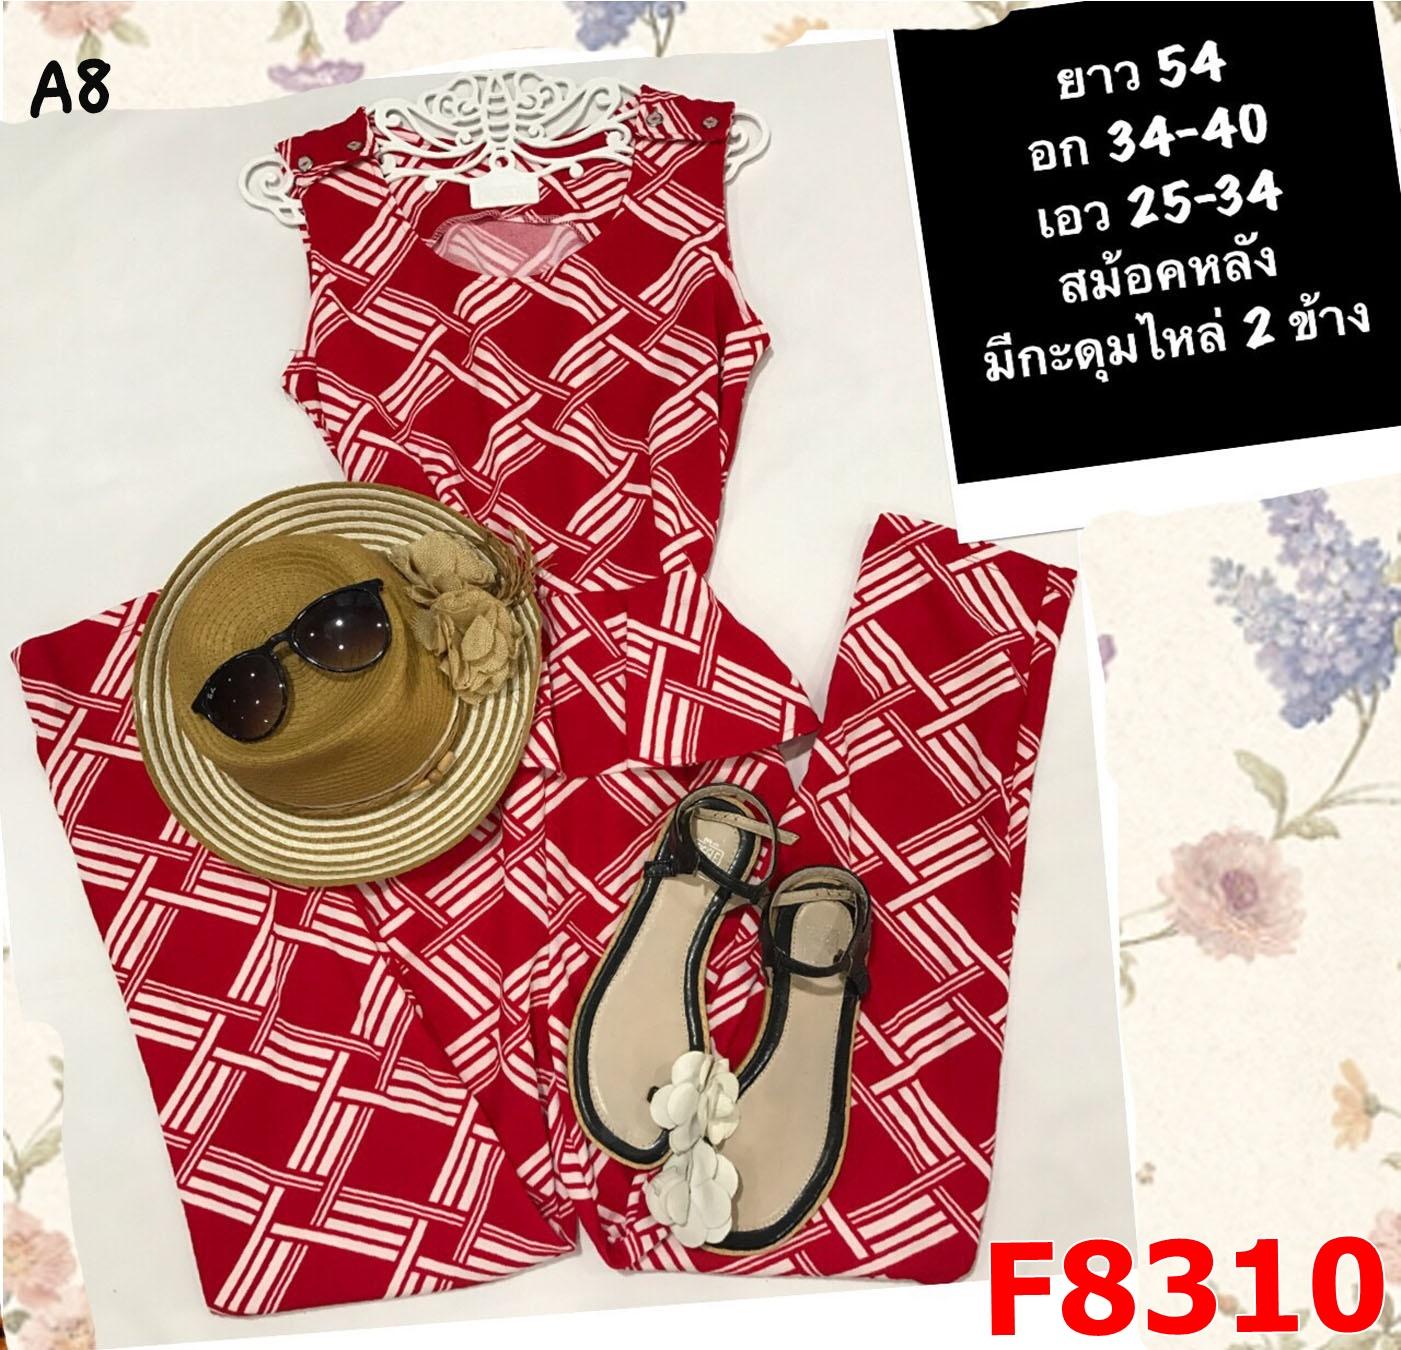 F8310ชุดจั้มกางเกงขายาวลายกราฟฟิคสีแดง ผ้ายืดแขนกุดมีกระดุมที่ไหล่สม้อคหลัง